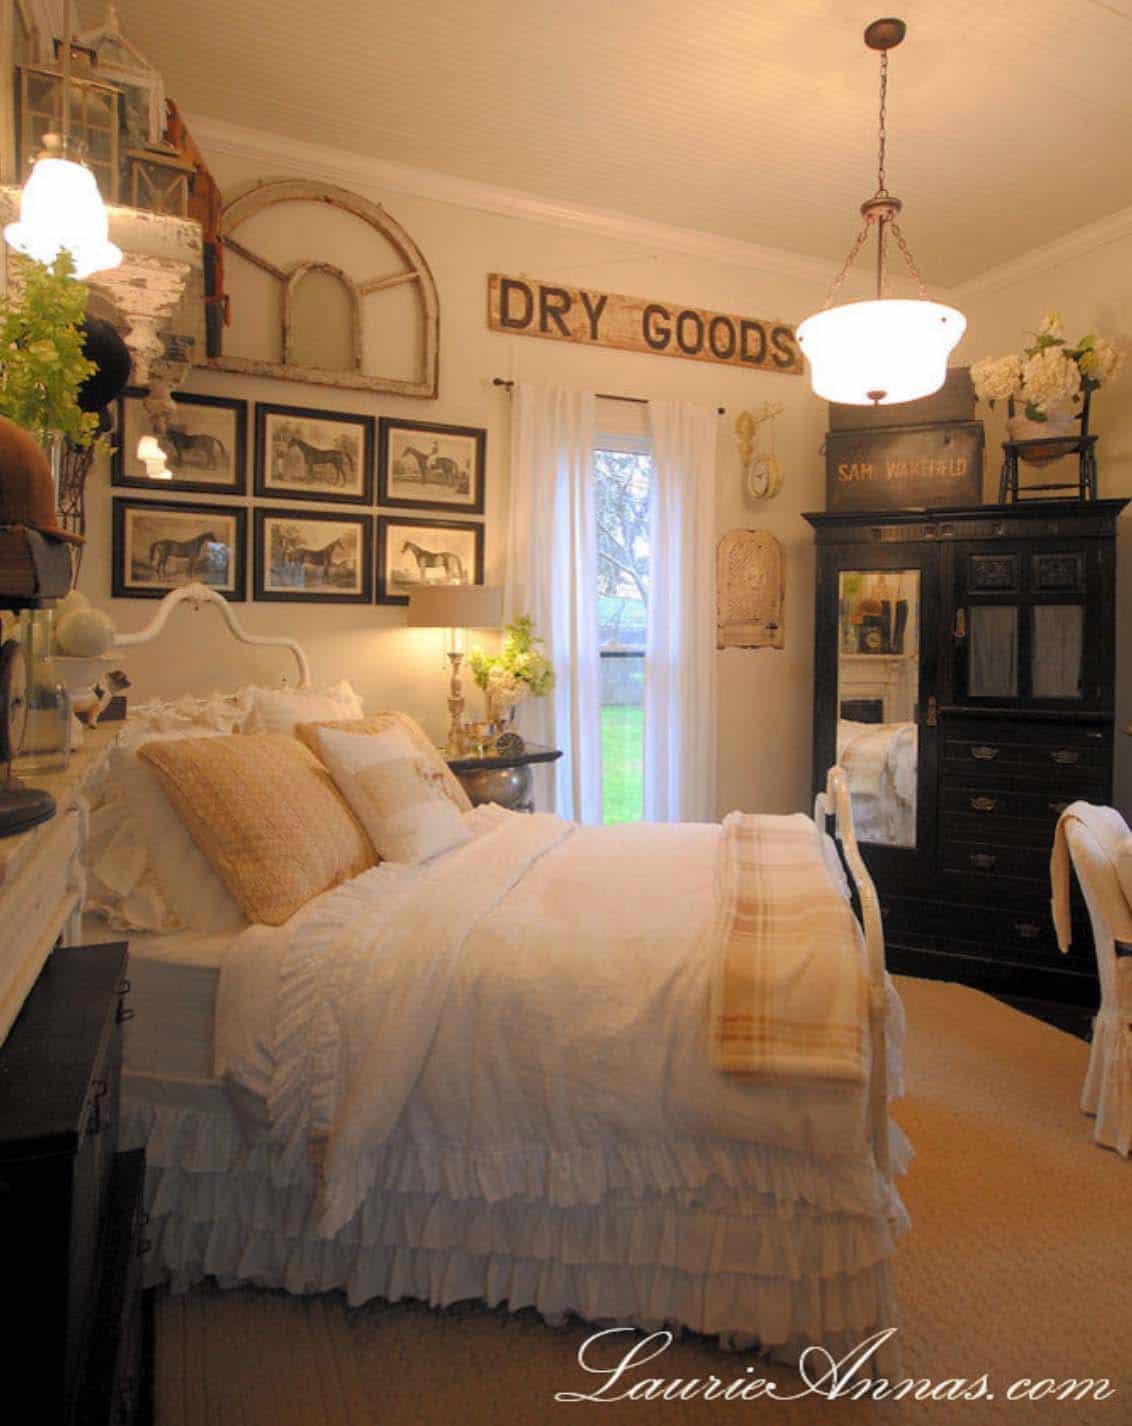 25 Absolutely breathtaking farmhouse style bedroom ideas ... on Bedroom Farmhouse Decor  id=67651